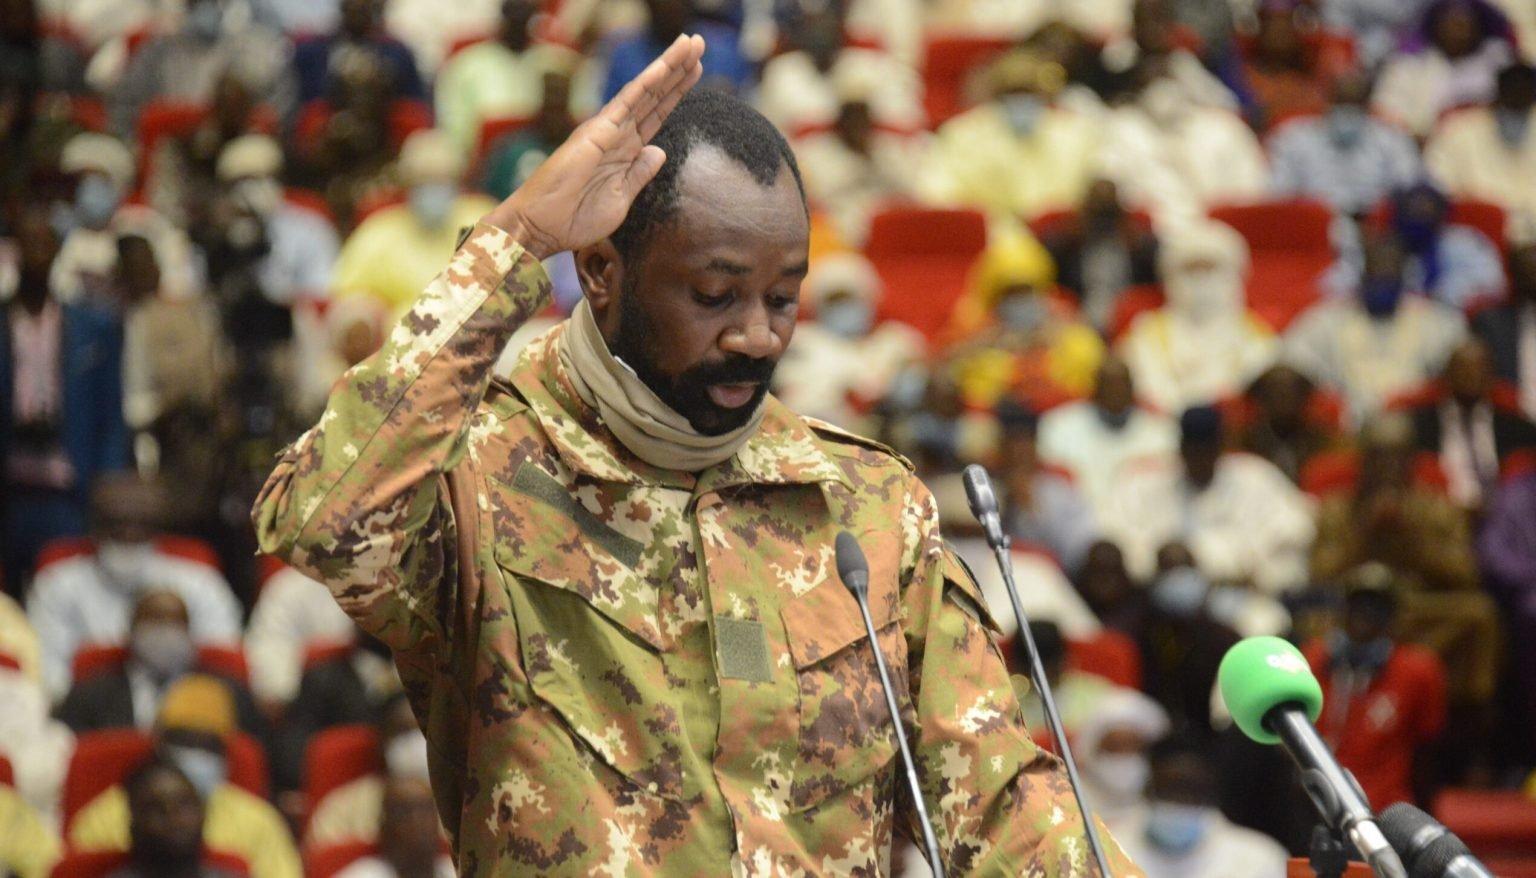 BREAKING: Mali interim President, Assimi Goita escapes assassination, full details